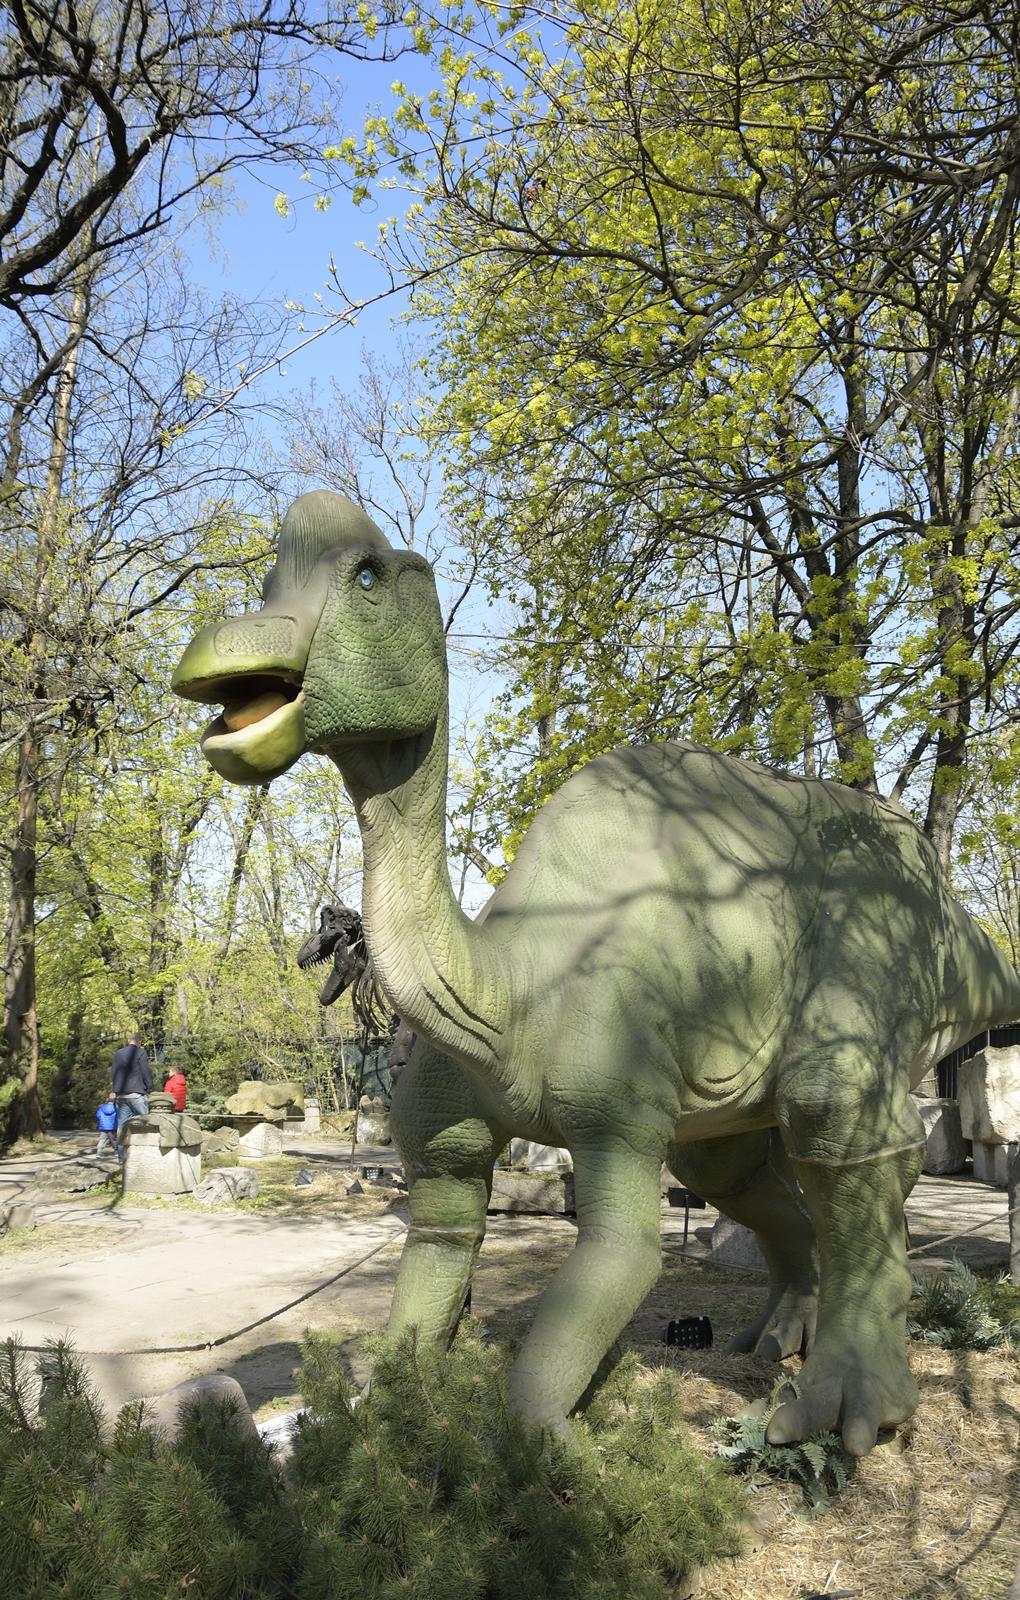 living dinosaurs